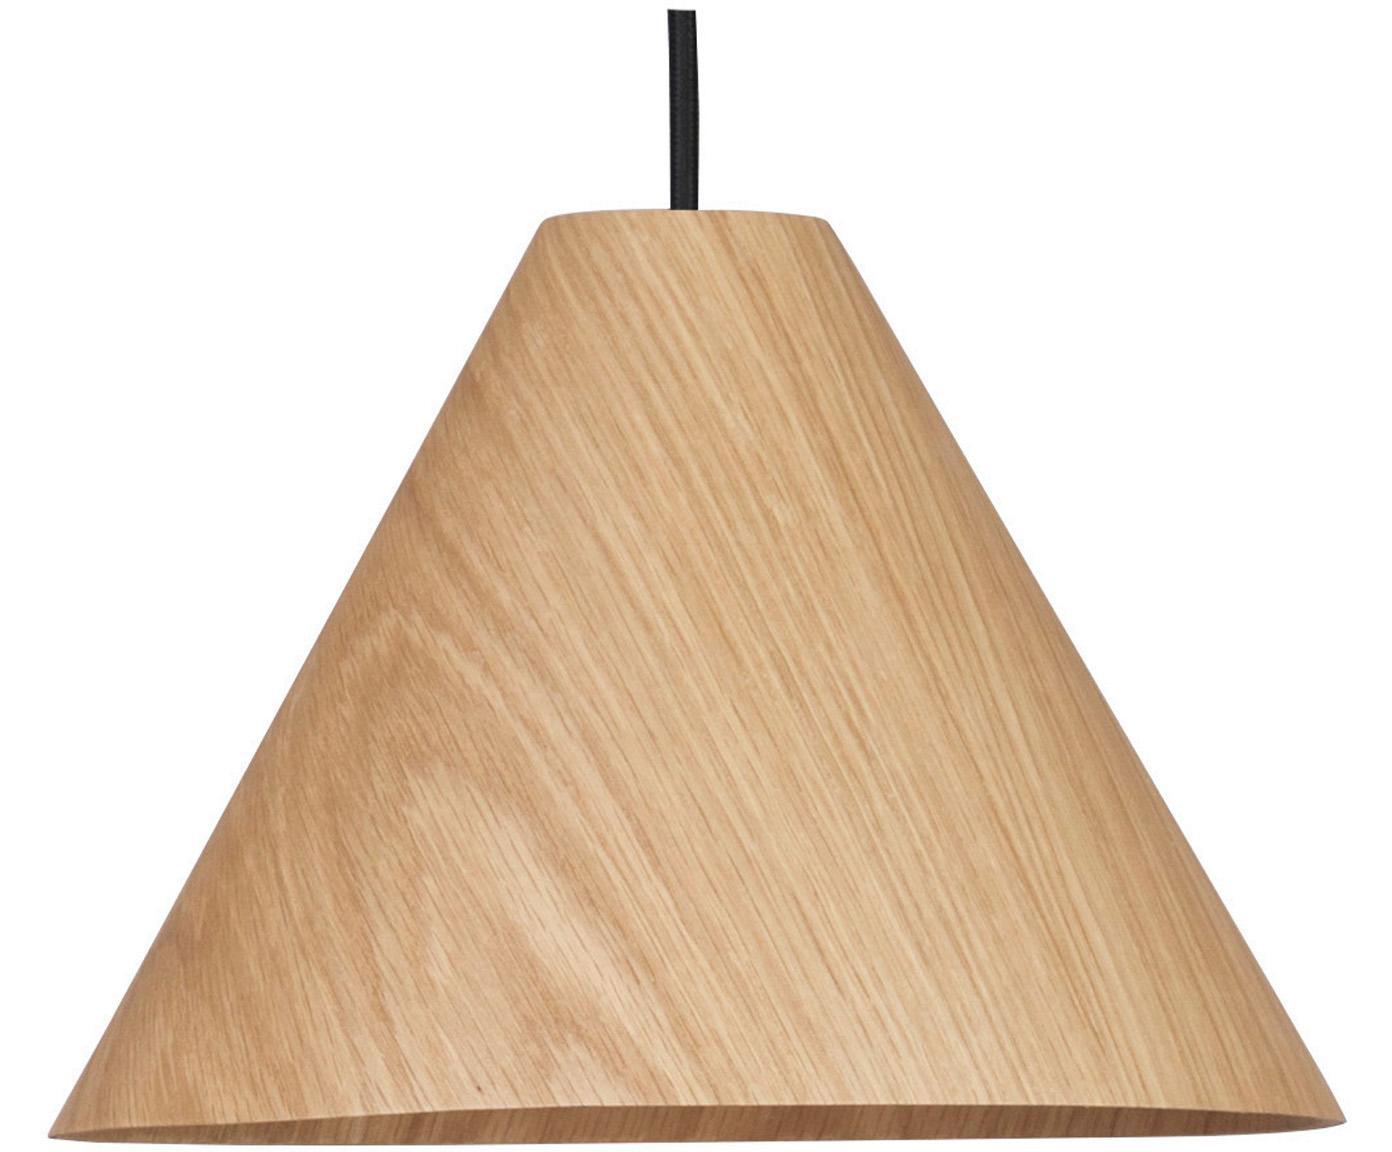 Pendelleuchte Wera aus Holz, Lampenschirm: Holz, Baldachin: Holz, Holz, Schwarz, Ø 25 x H 130 cm